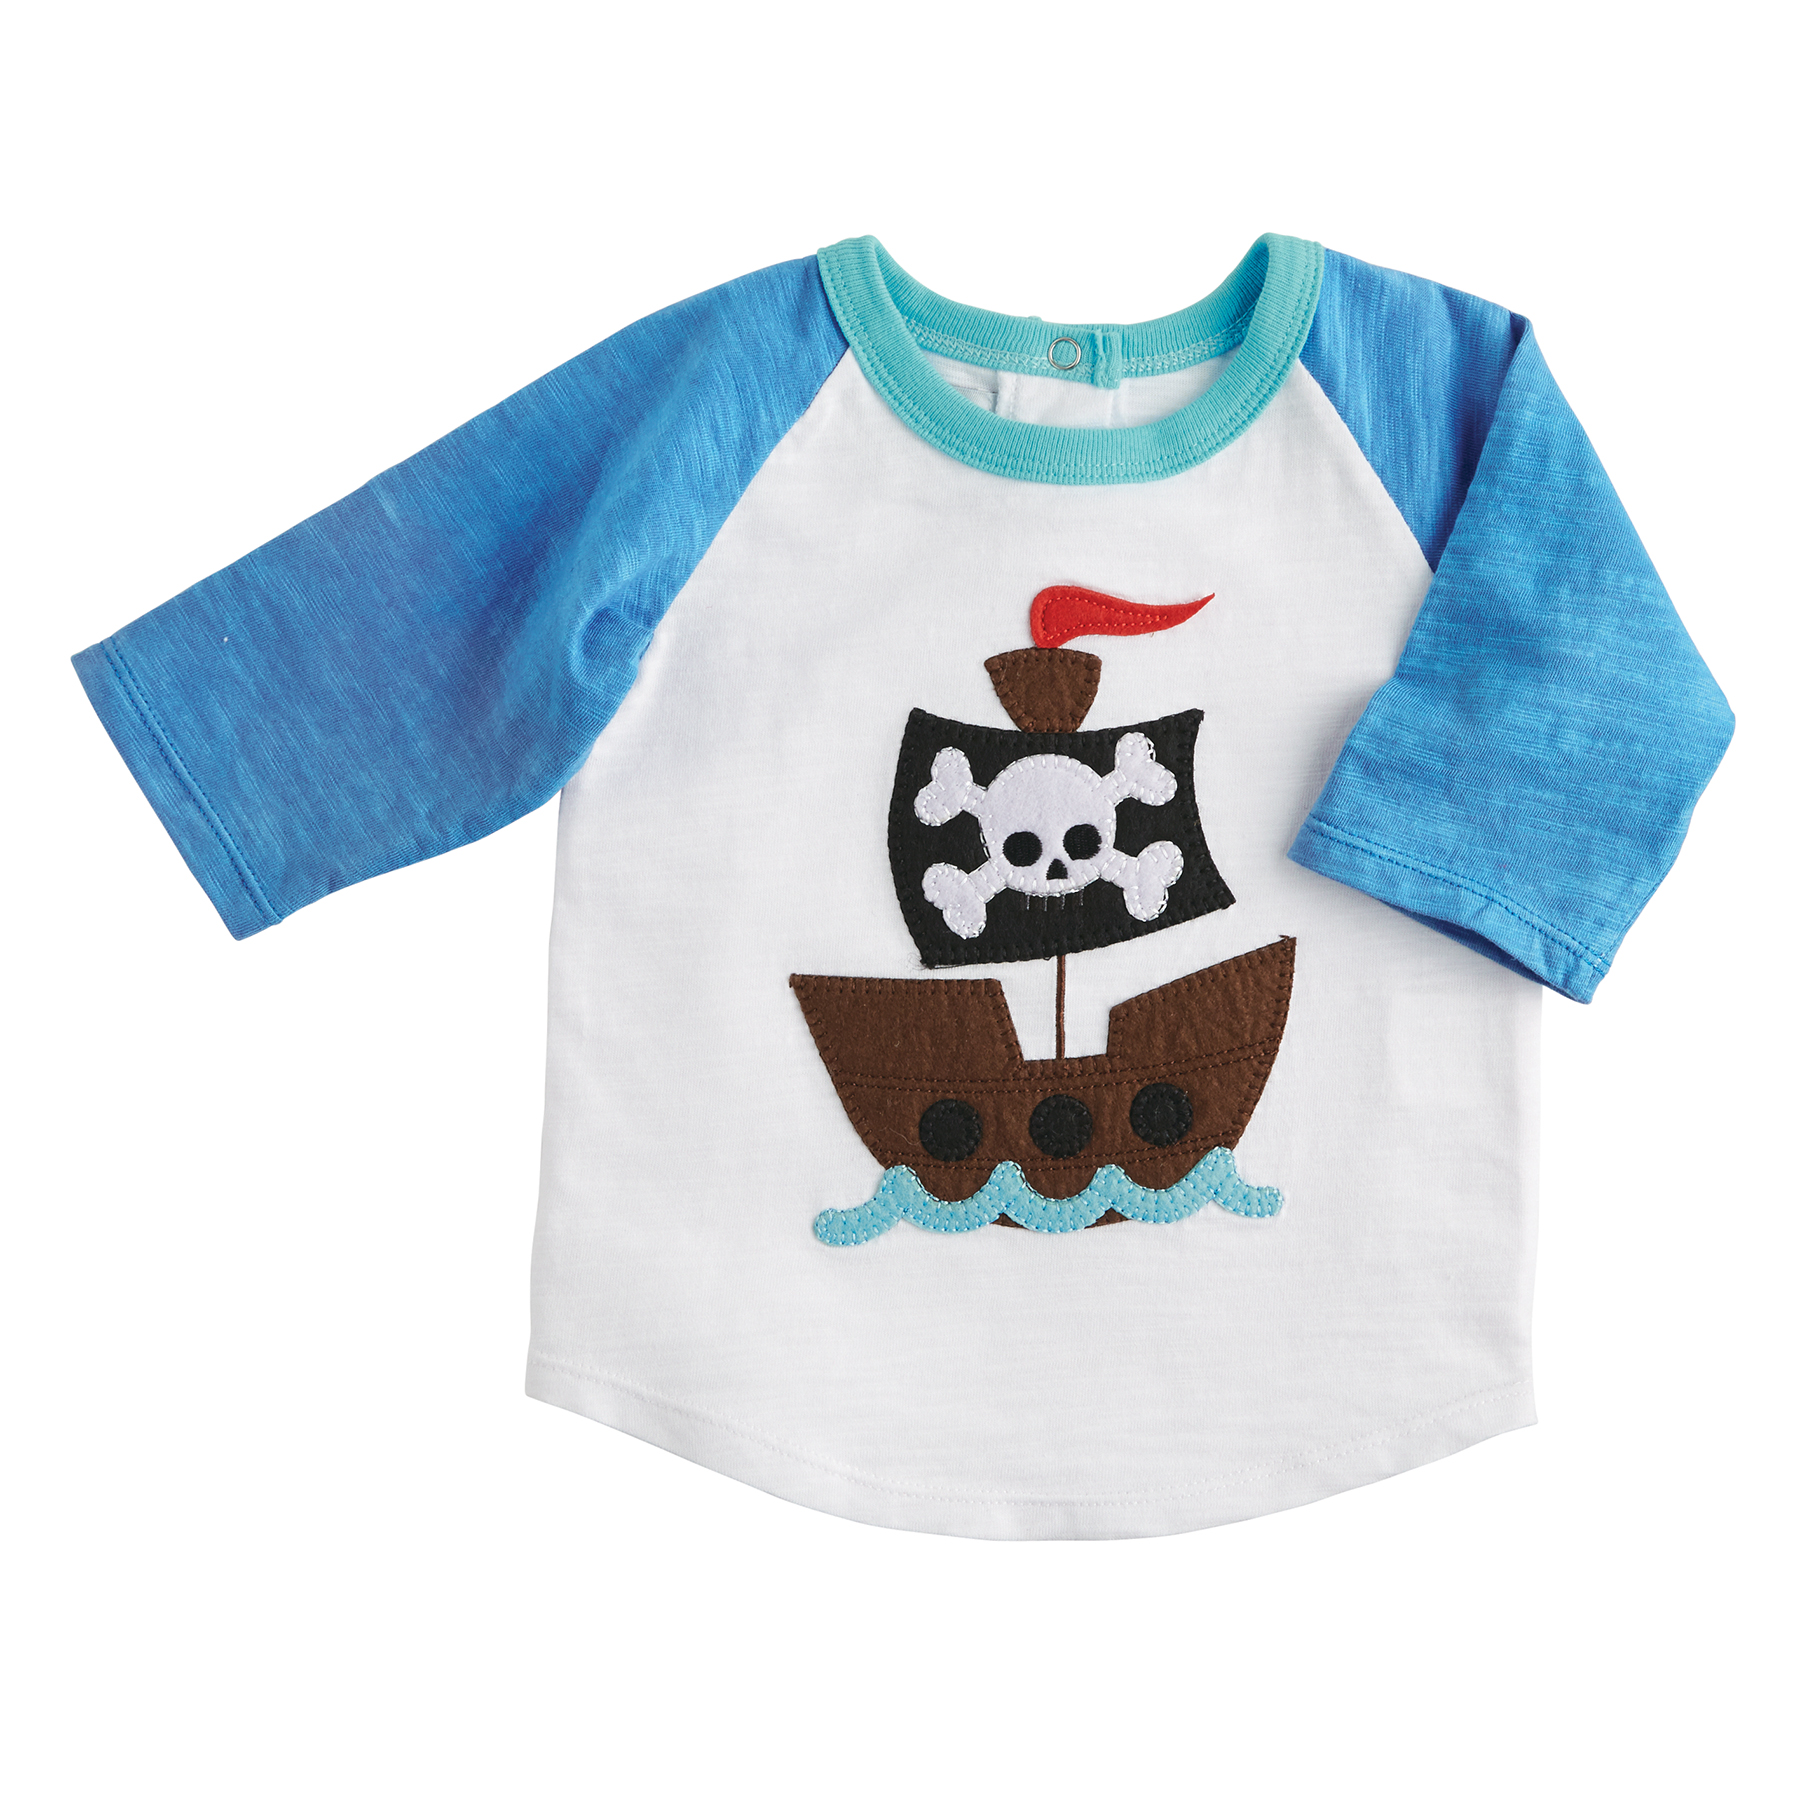 Mud Pie Mk6 Shark Tank Baby Toddler Boy T Shirt Shark